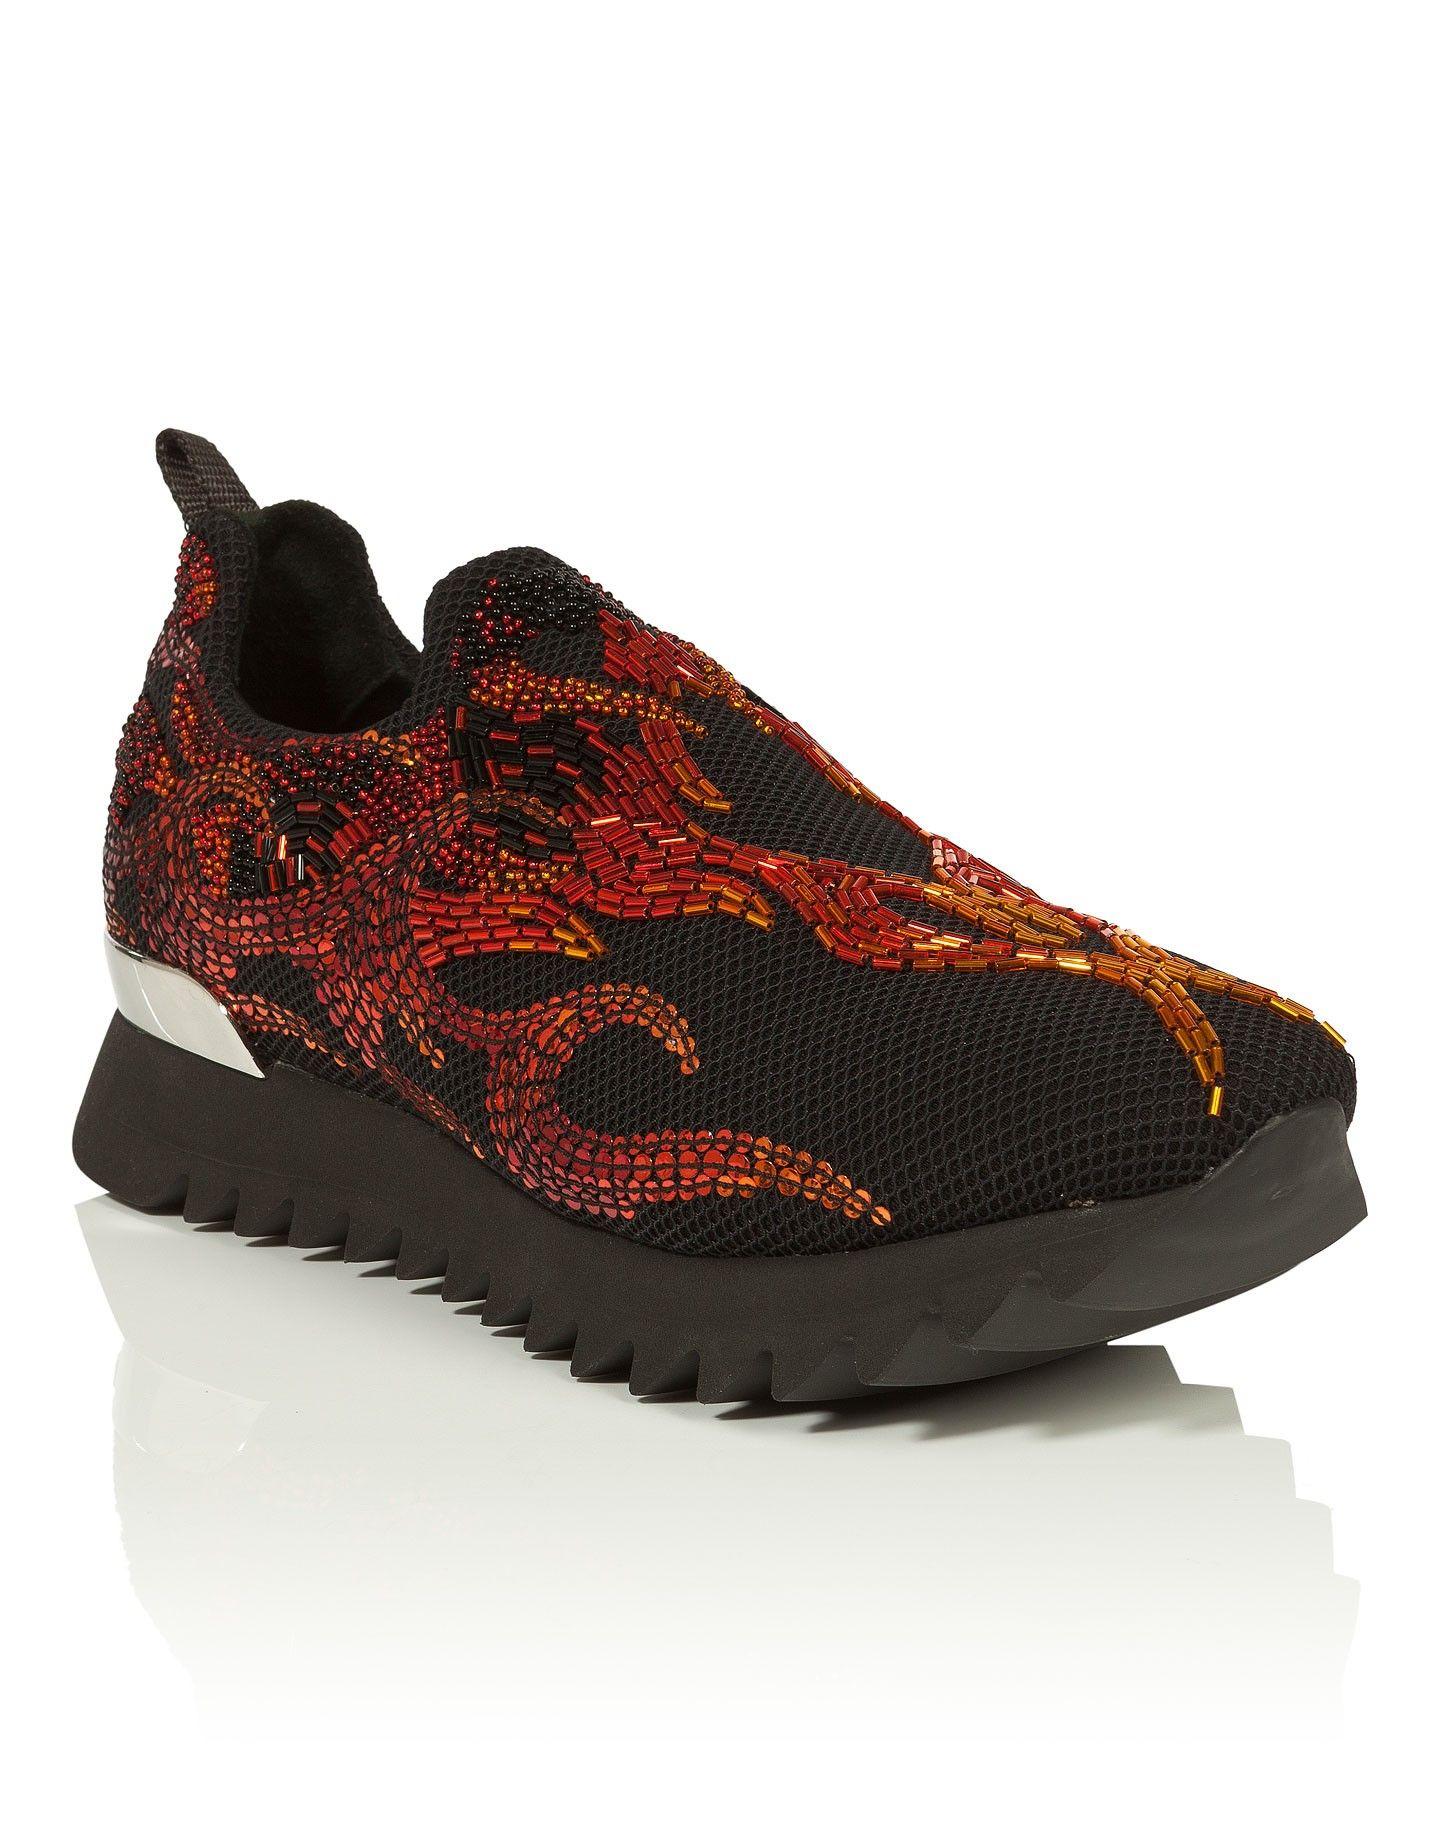 "PHILIPP PLEIN RUNNER ""DOHA"". #philippplein #shoes #"